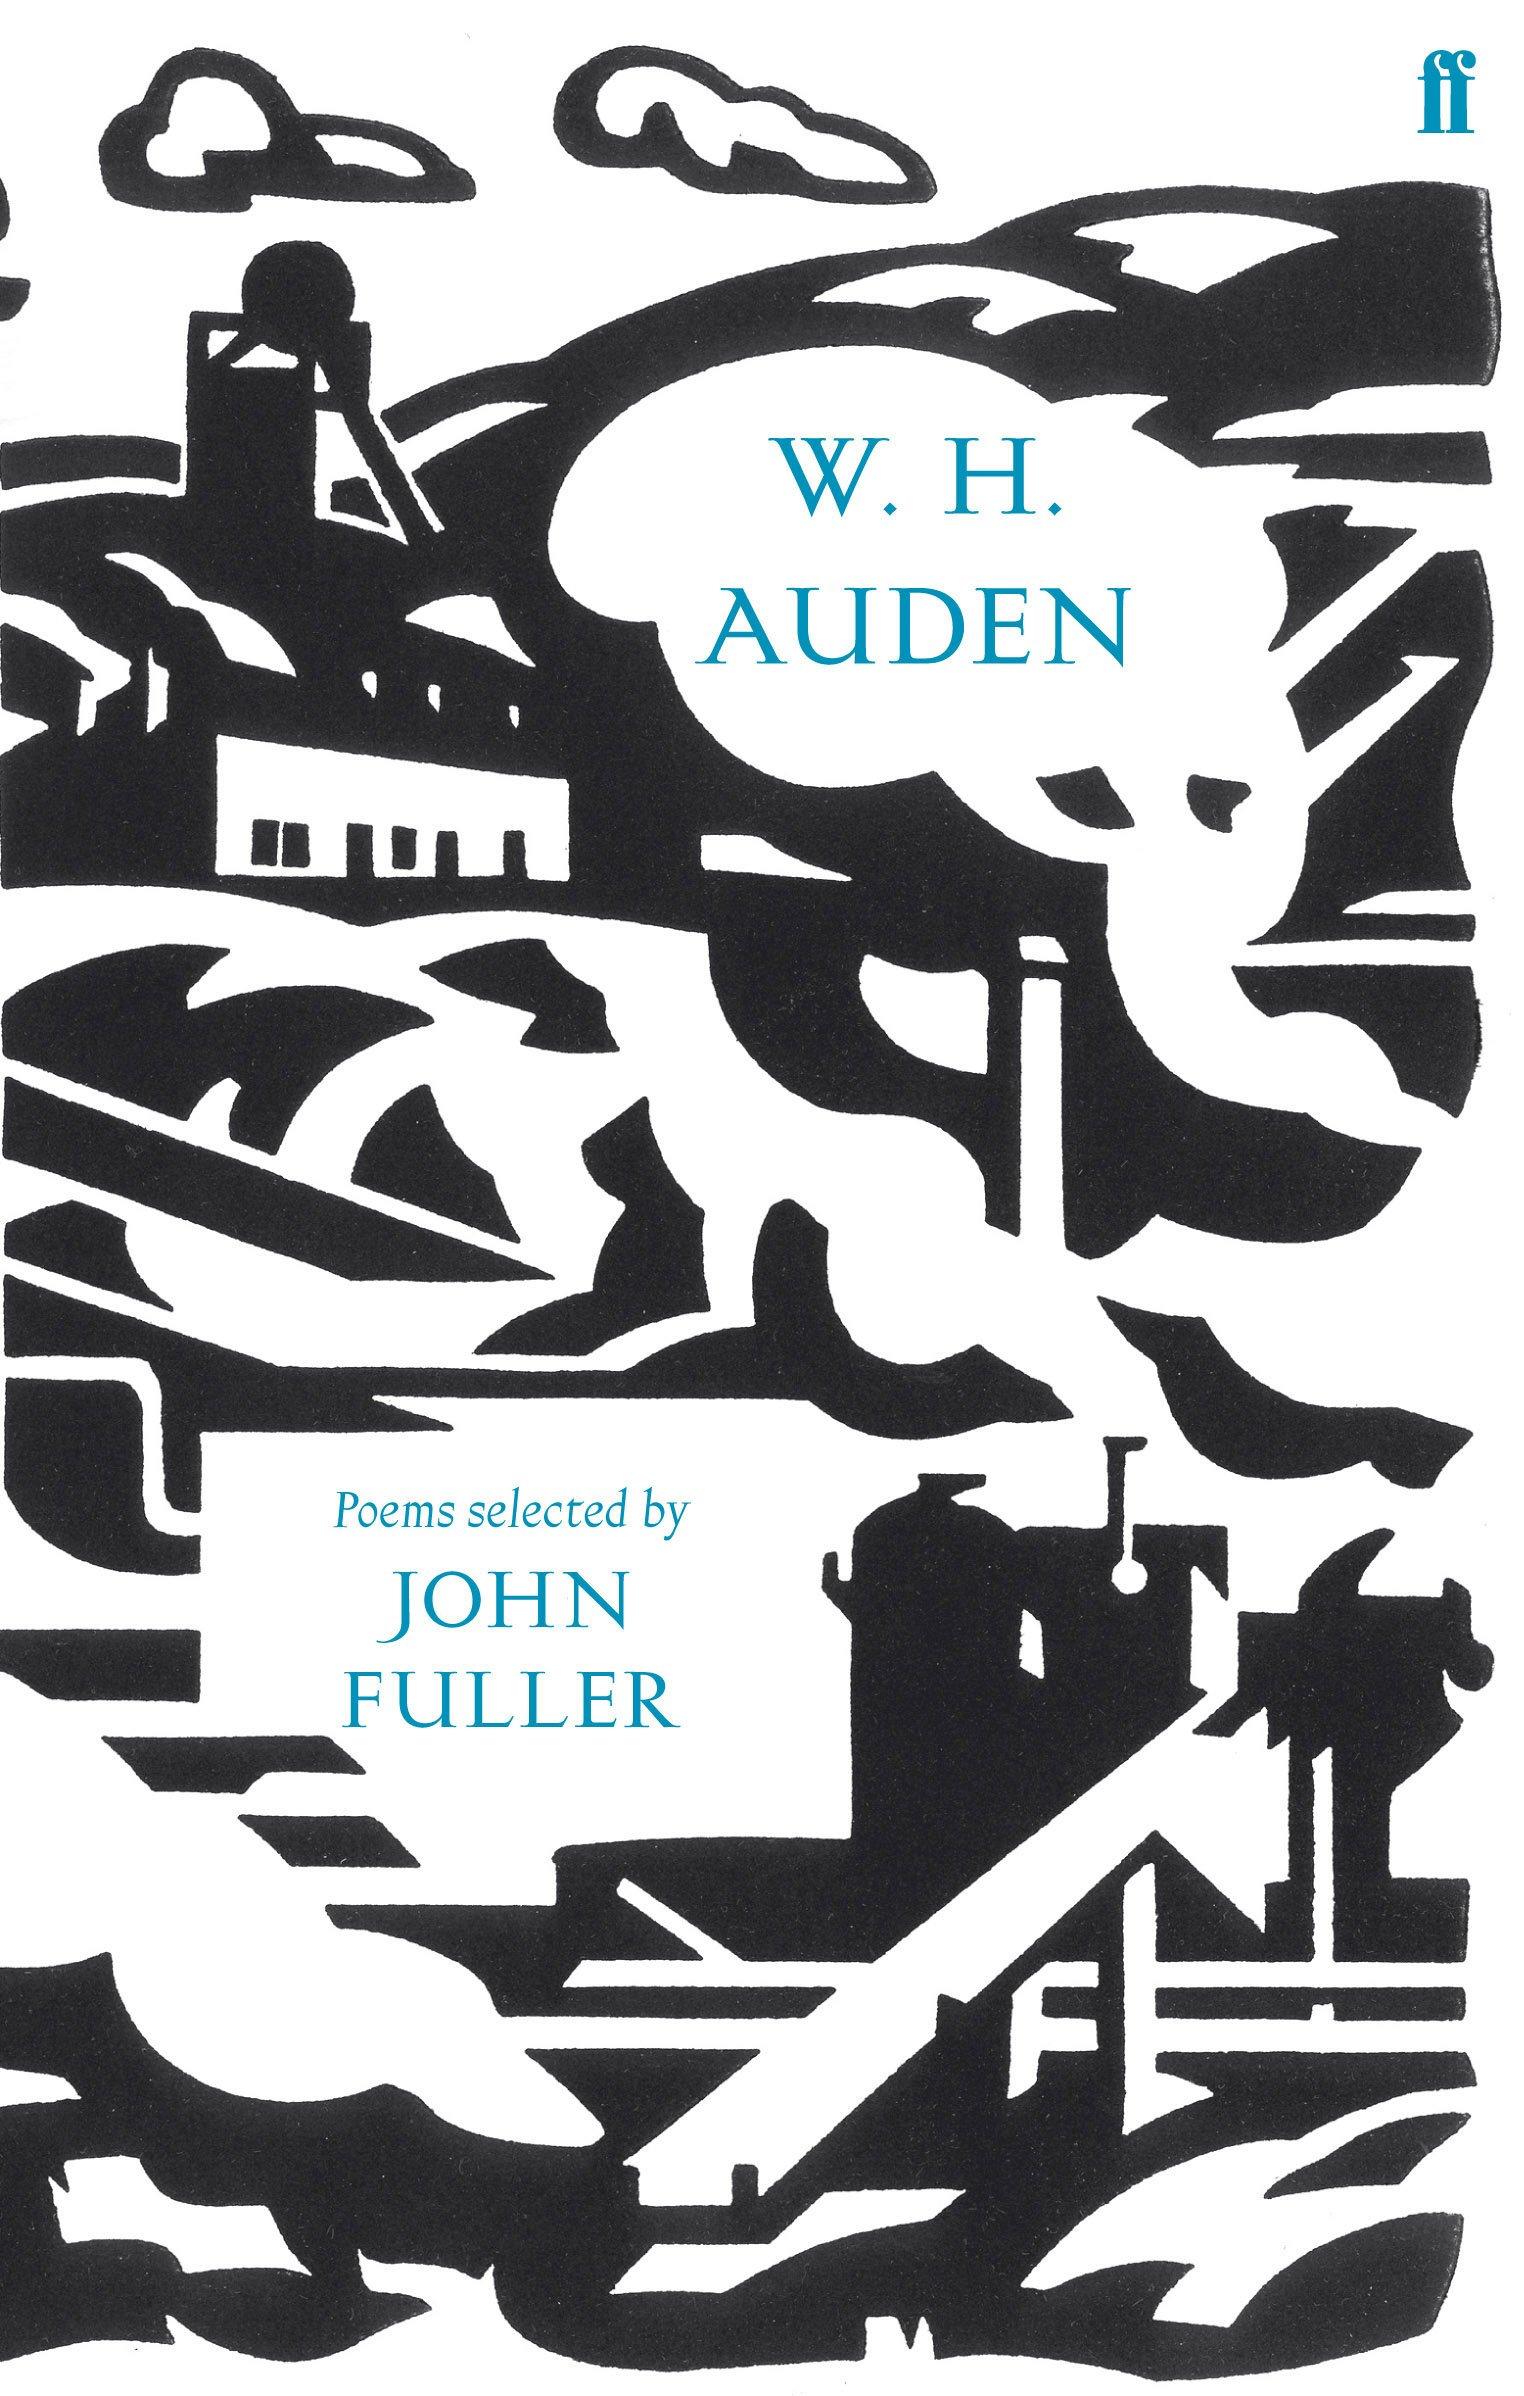 W h auden clipart clip art library W. H. Auden (Poems selected by John Fuller): Amazon.co.uk ... clip art library